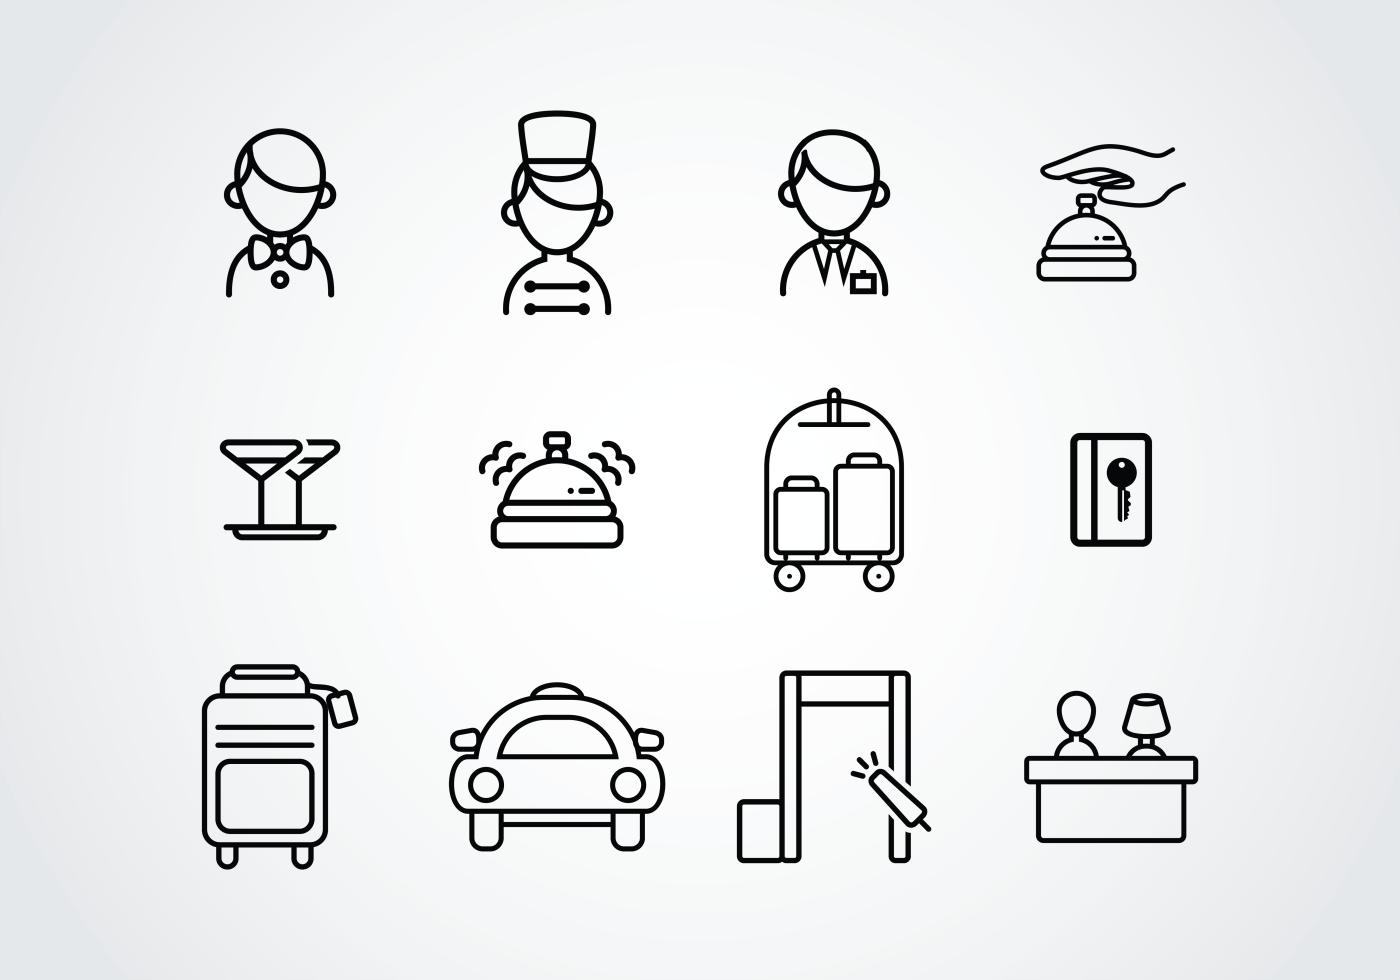 concierge pictogram icons